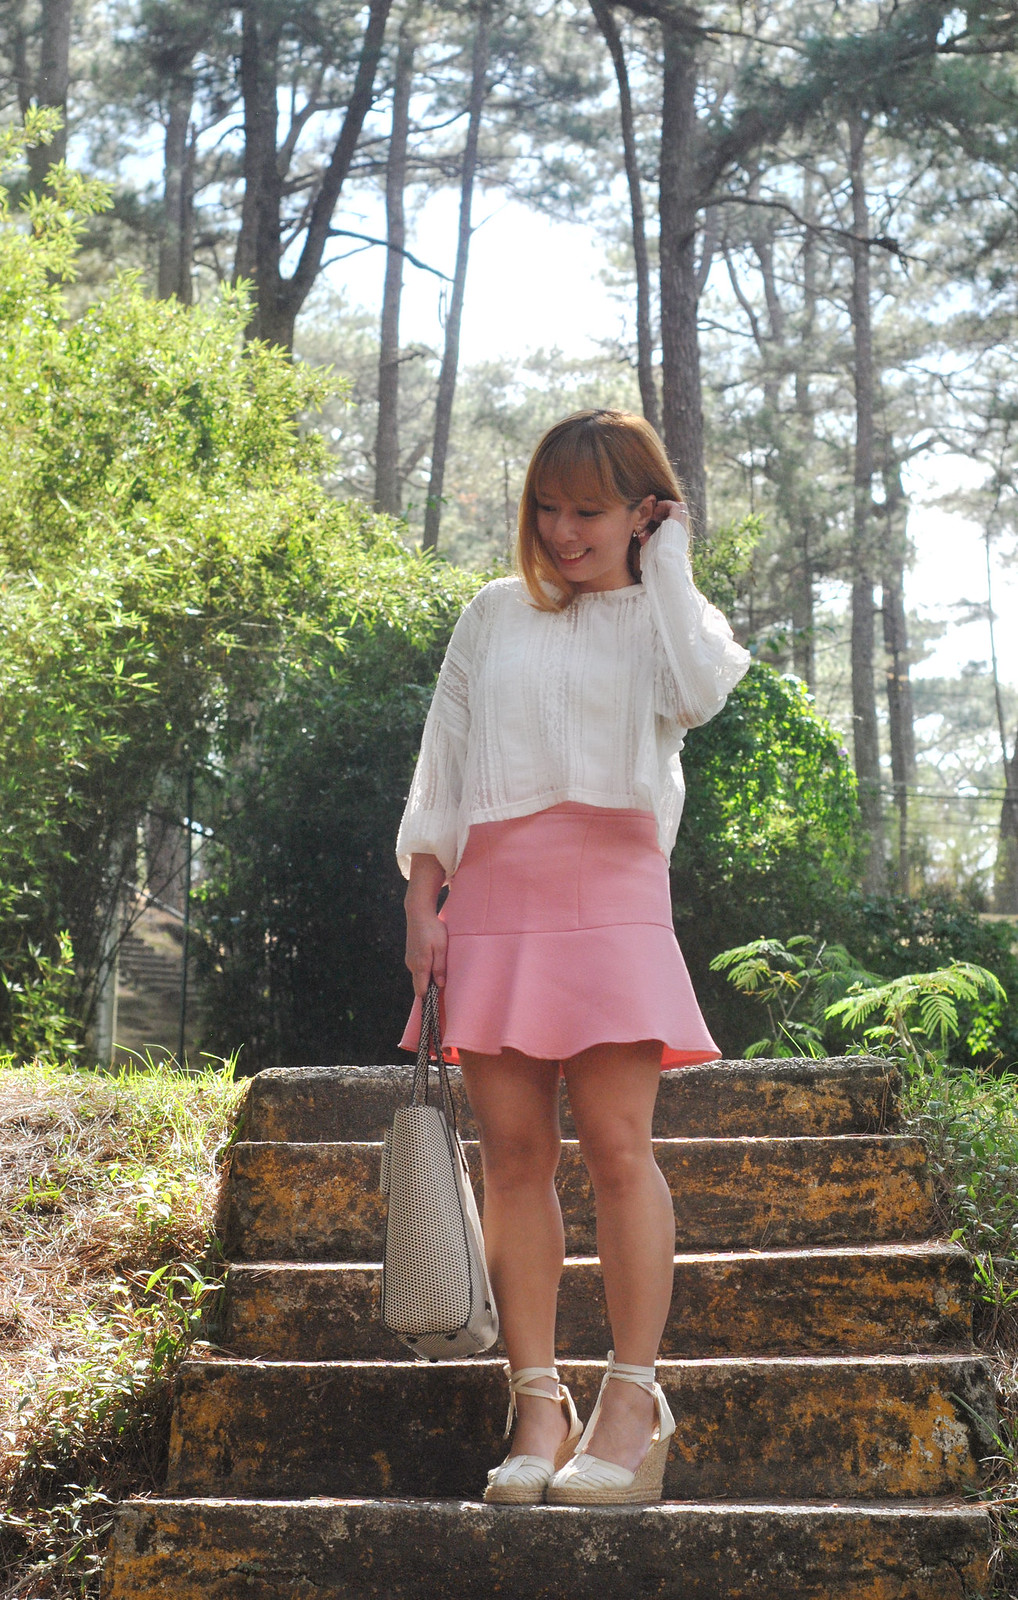 cherryl ramos zara skirt baguio stylenanda